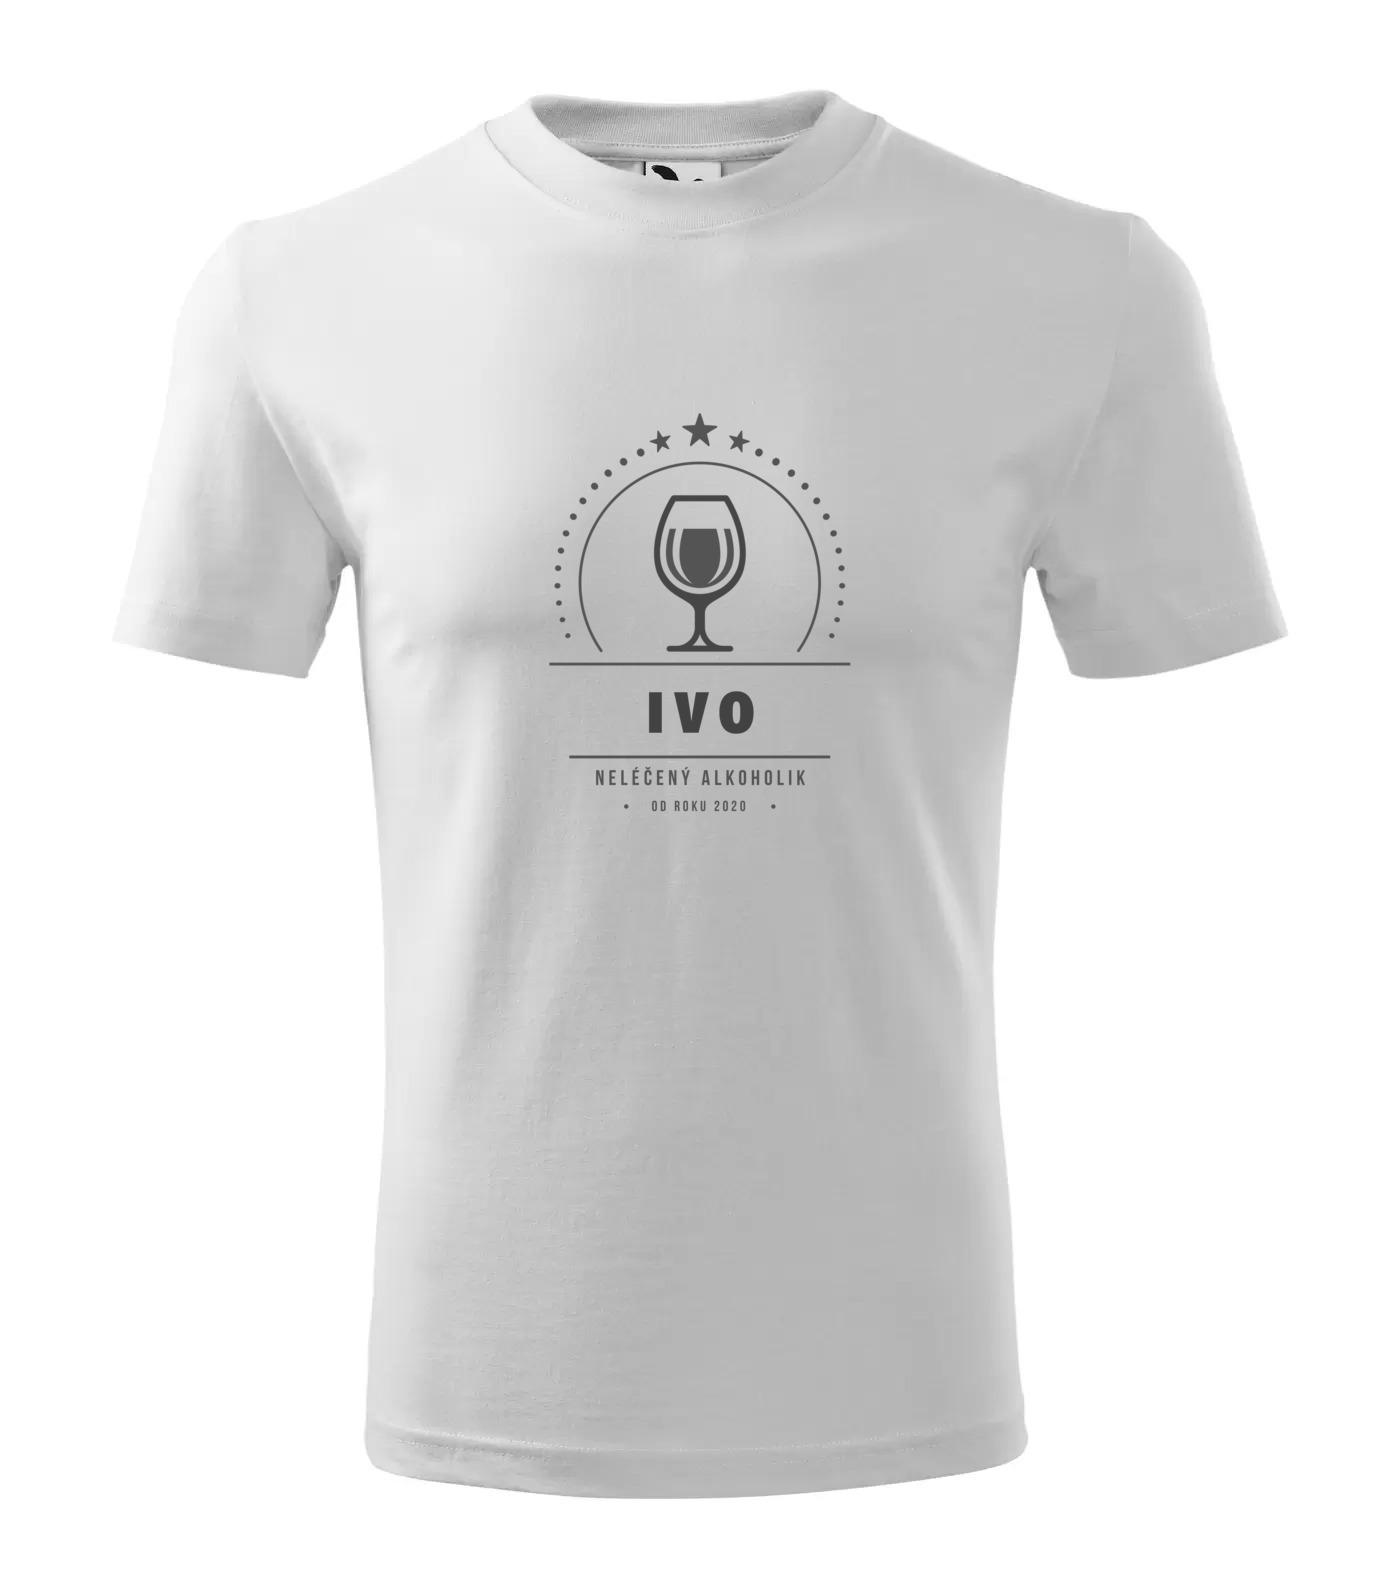 Tričko Alkoholik Ivo